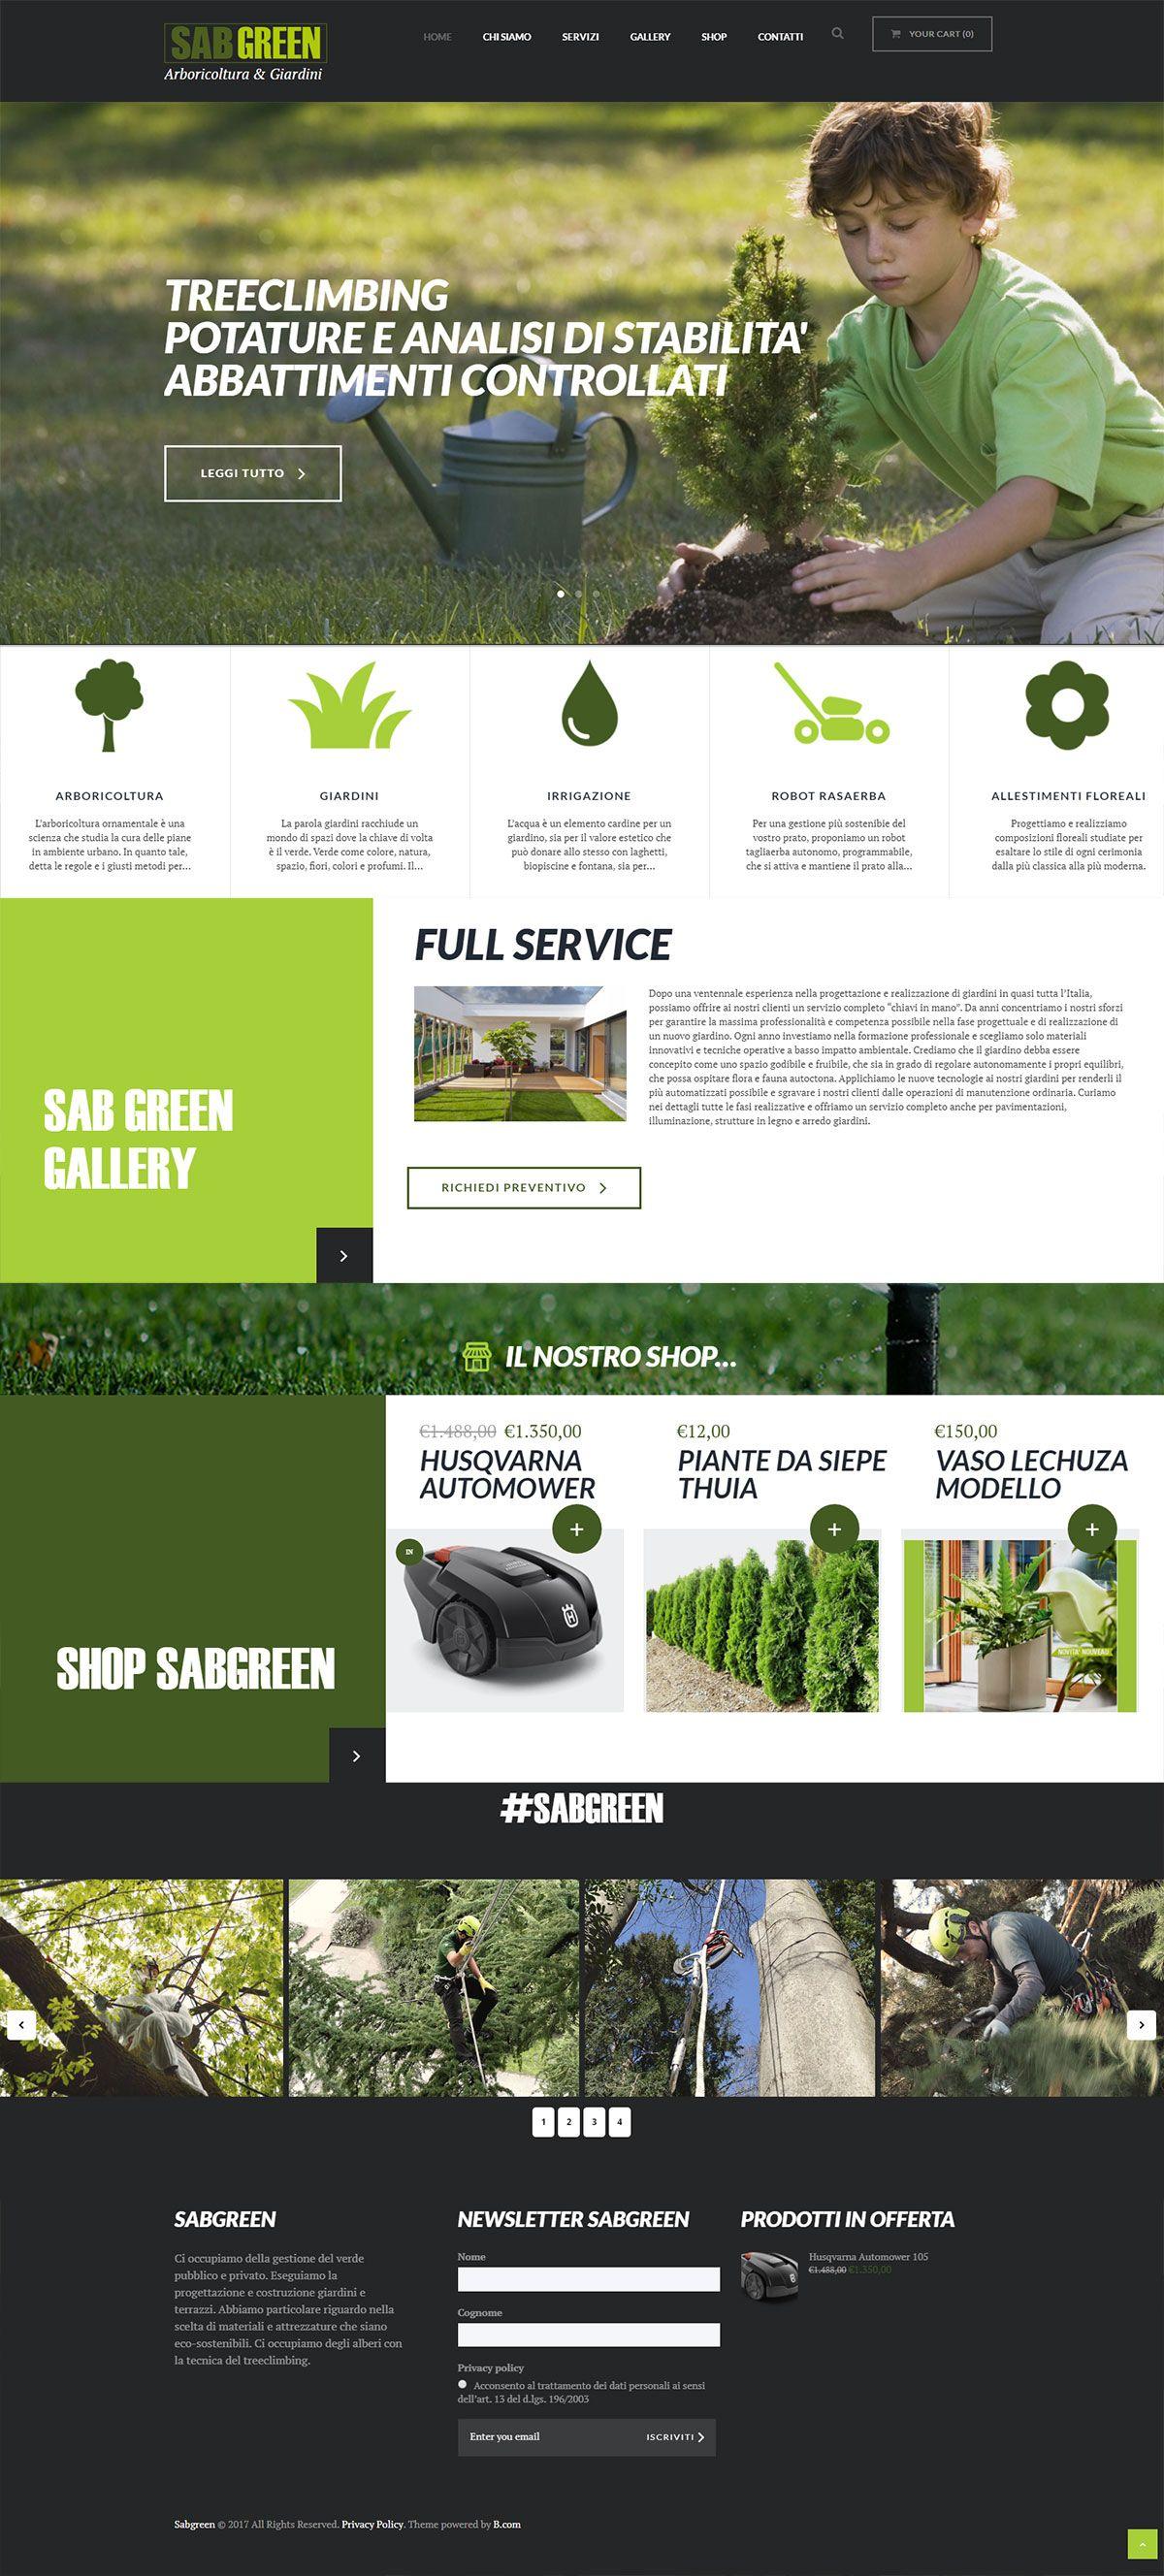 Web Site SabGreen - Arboricoltura e Giardini